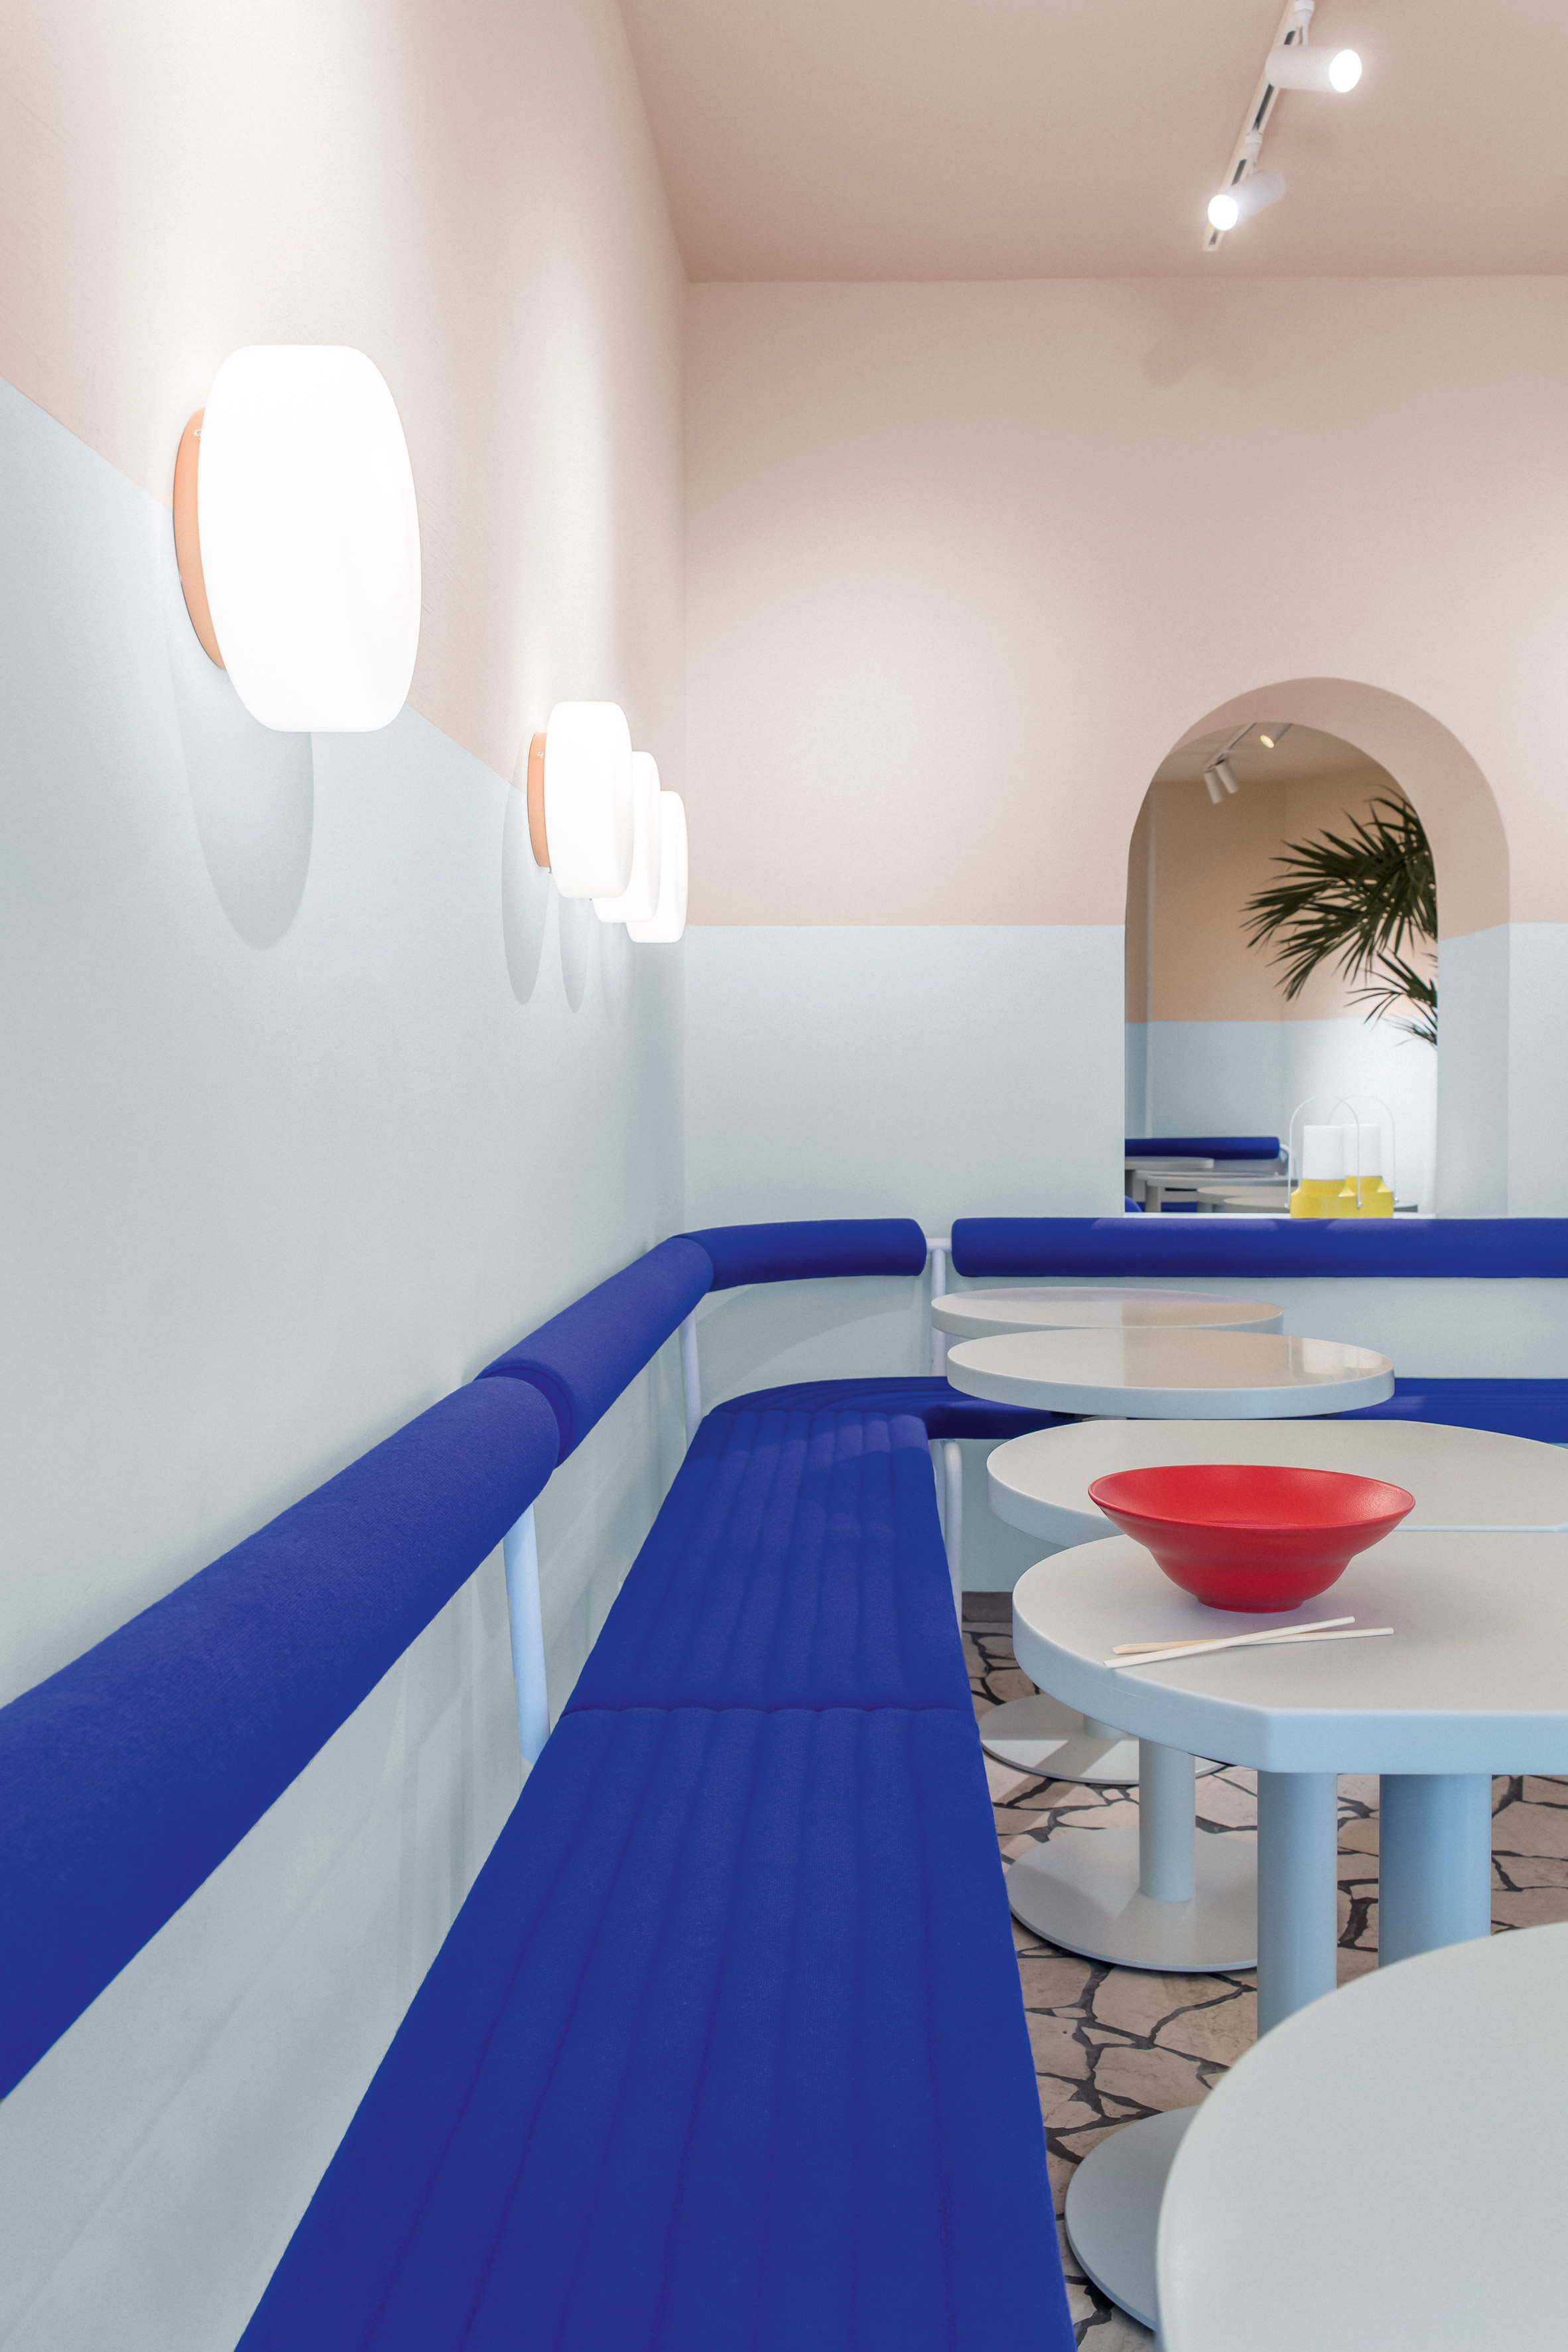 la-poke-restaurant-ester-bruzkus-interiors_dezainaa_1